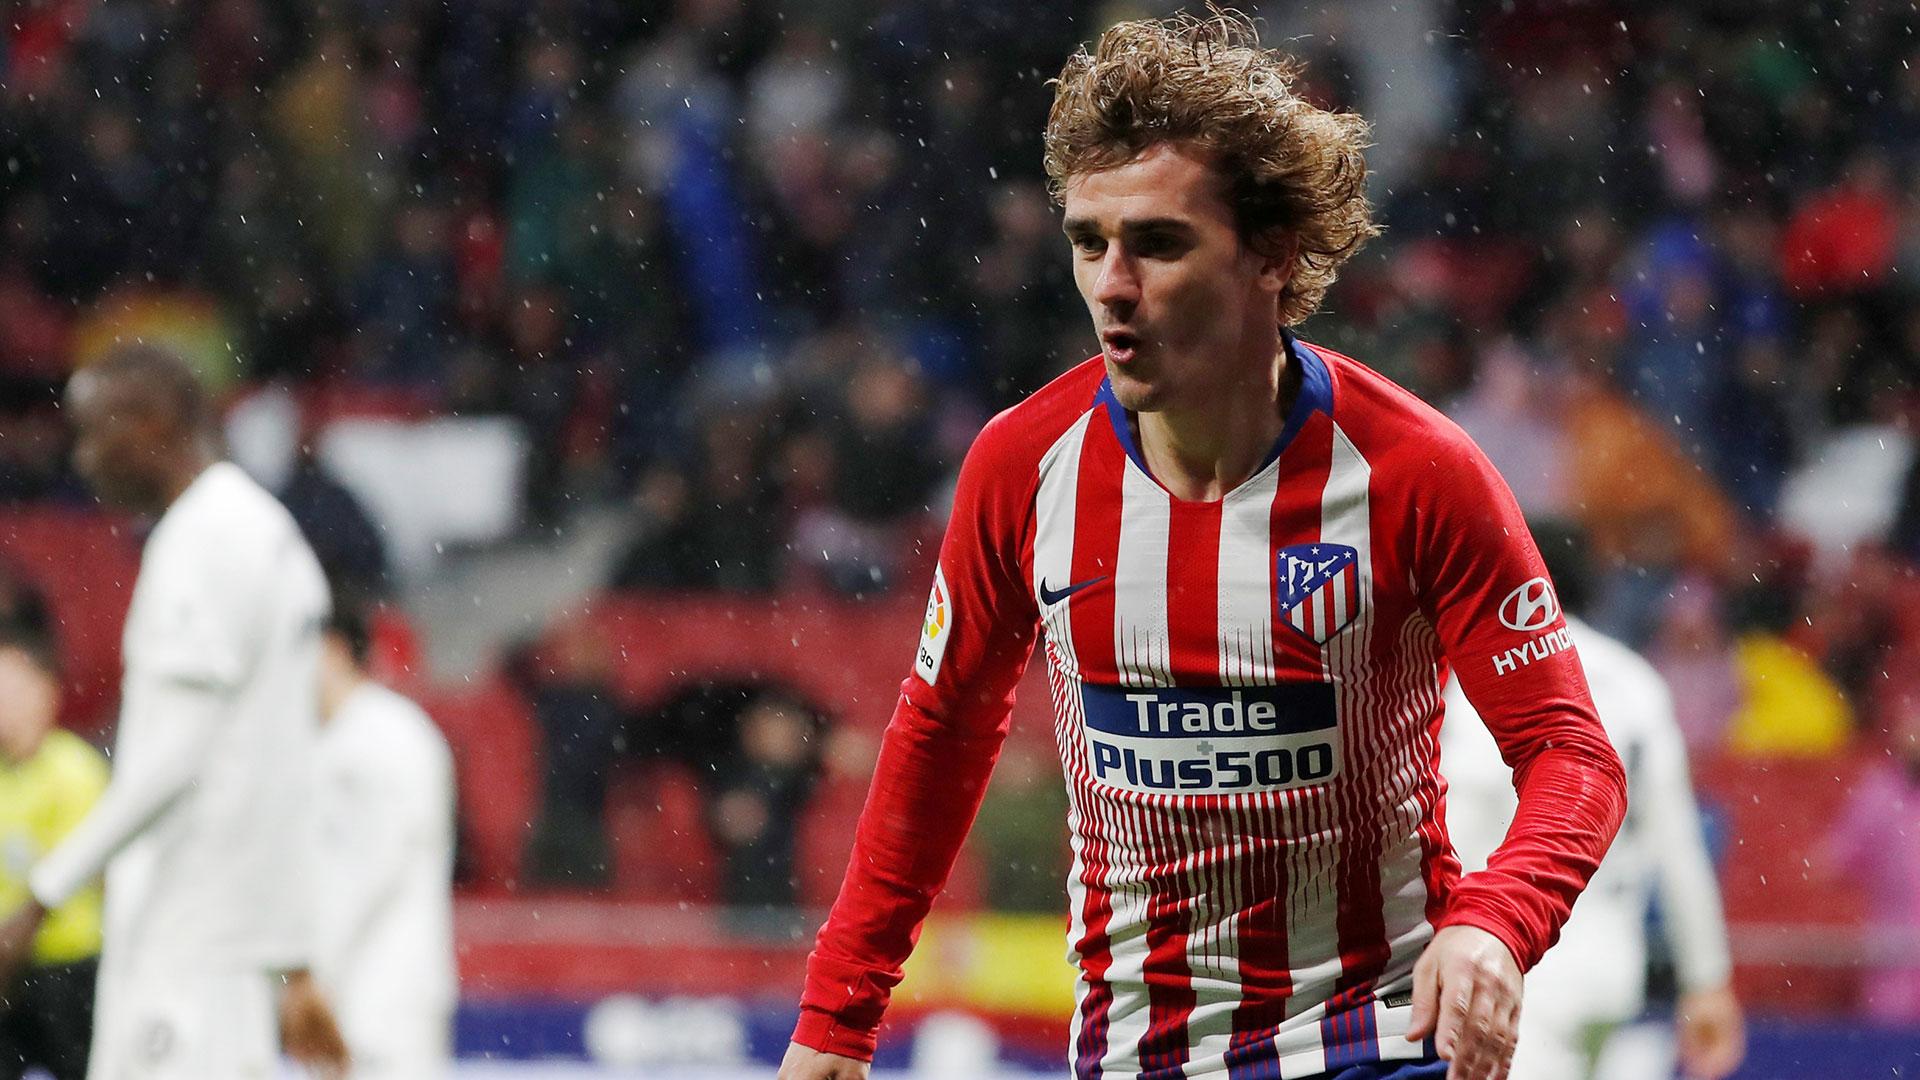 Griezmann anunció su salida del Atlético de Madrid (Reuters)